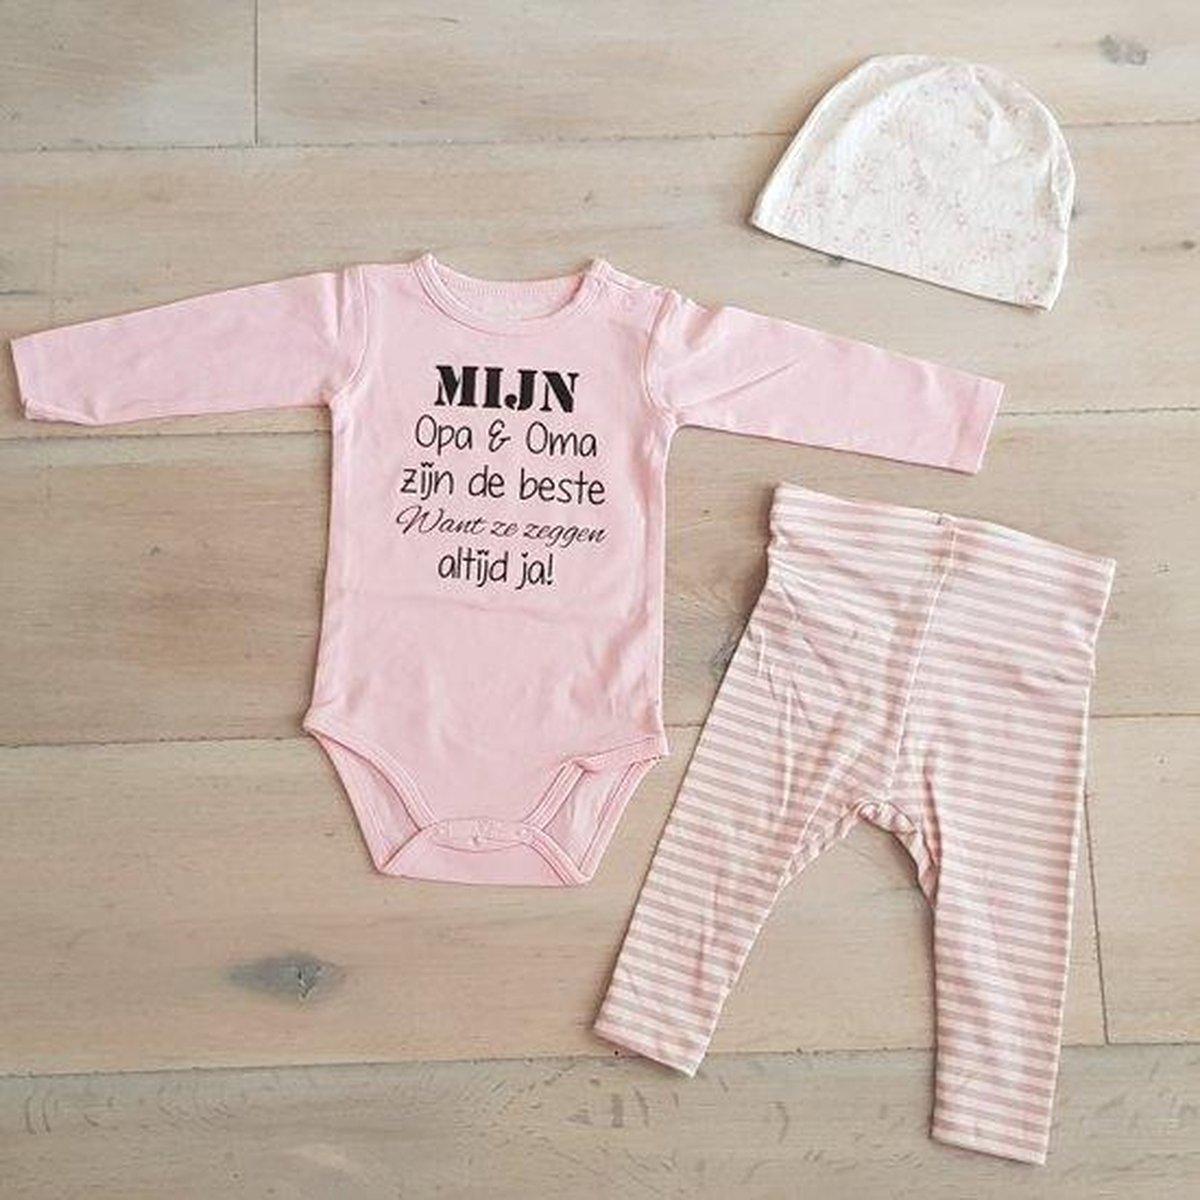 Baby Meisjes Setje 3-delig newborn | maat 62-68 | roze mutsje beertje roze broekje streep en roze romper lange mouw met tekst zwart mijn opa en oma zijn de beste want ze zeggen altijd ja